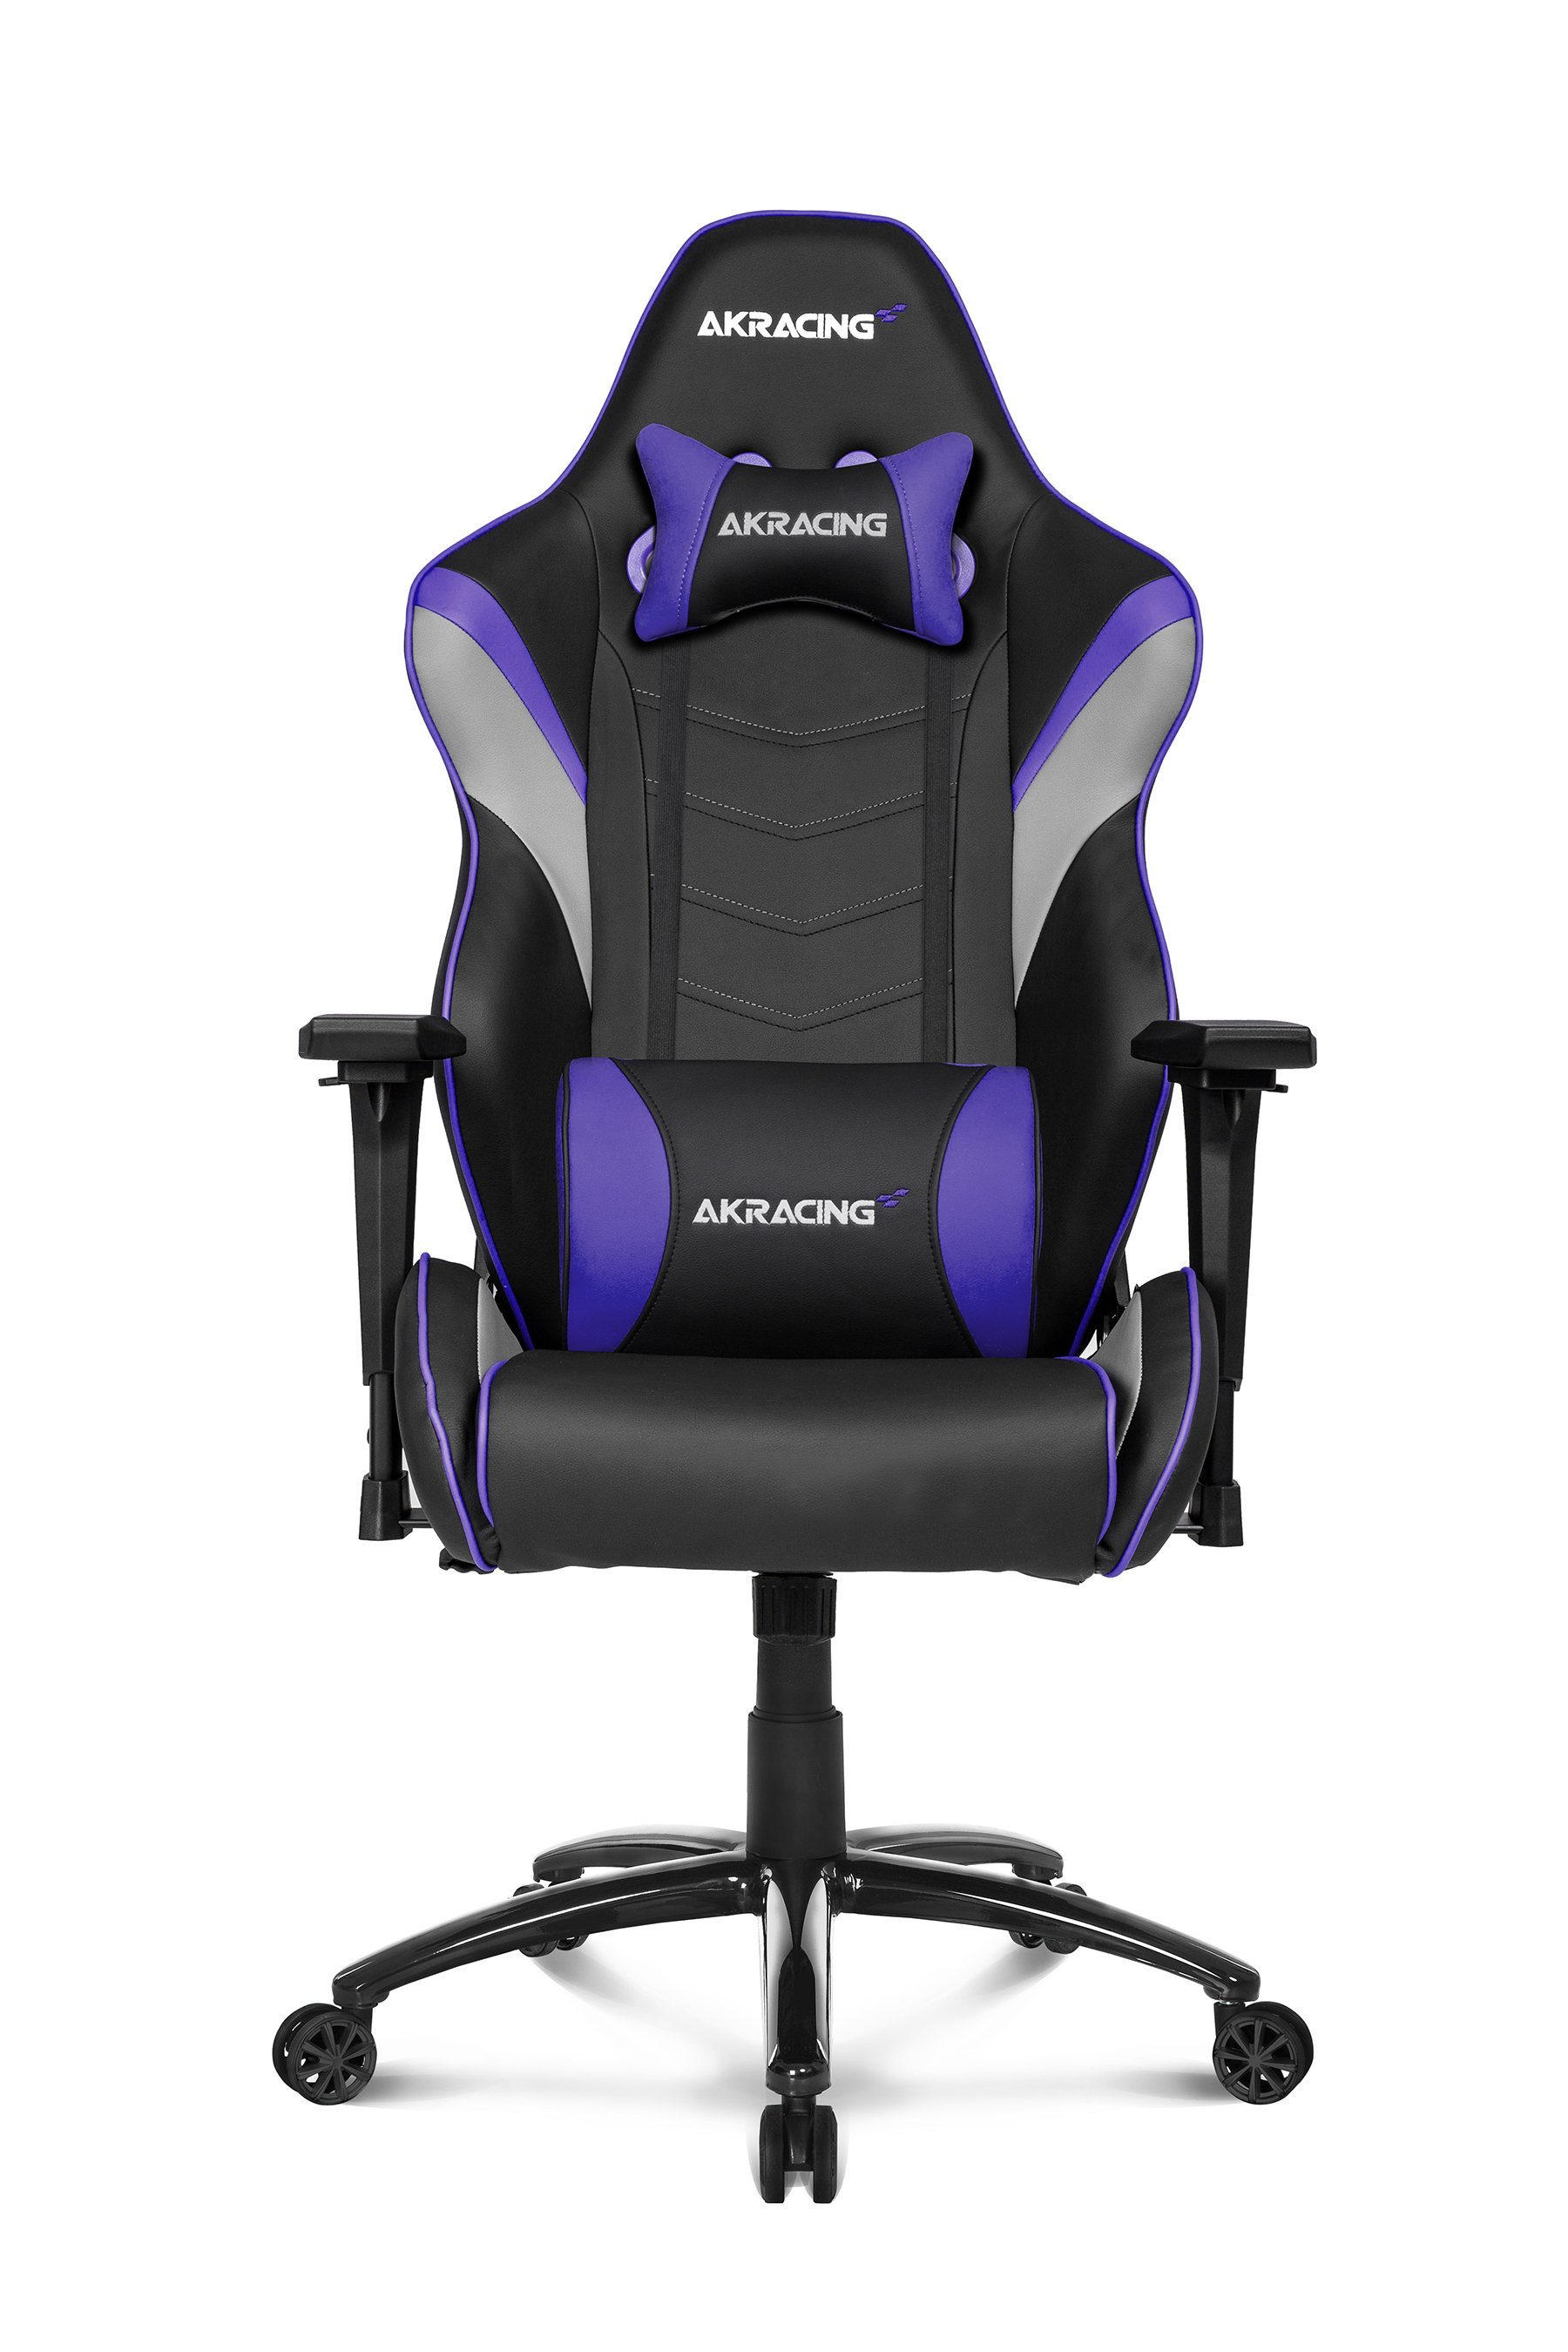 AKRacing LX - PC-Spielstuhl - PC - 150 kg - Gepolsterter - ausgestopfter Sitz - Gepolsterte - ausgestopfte Rückenlehne - Rennen